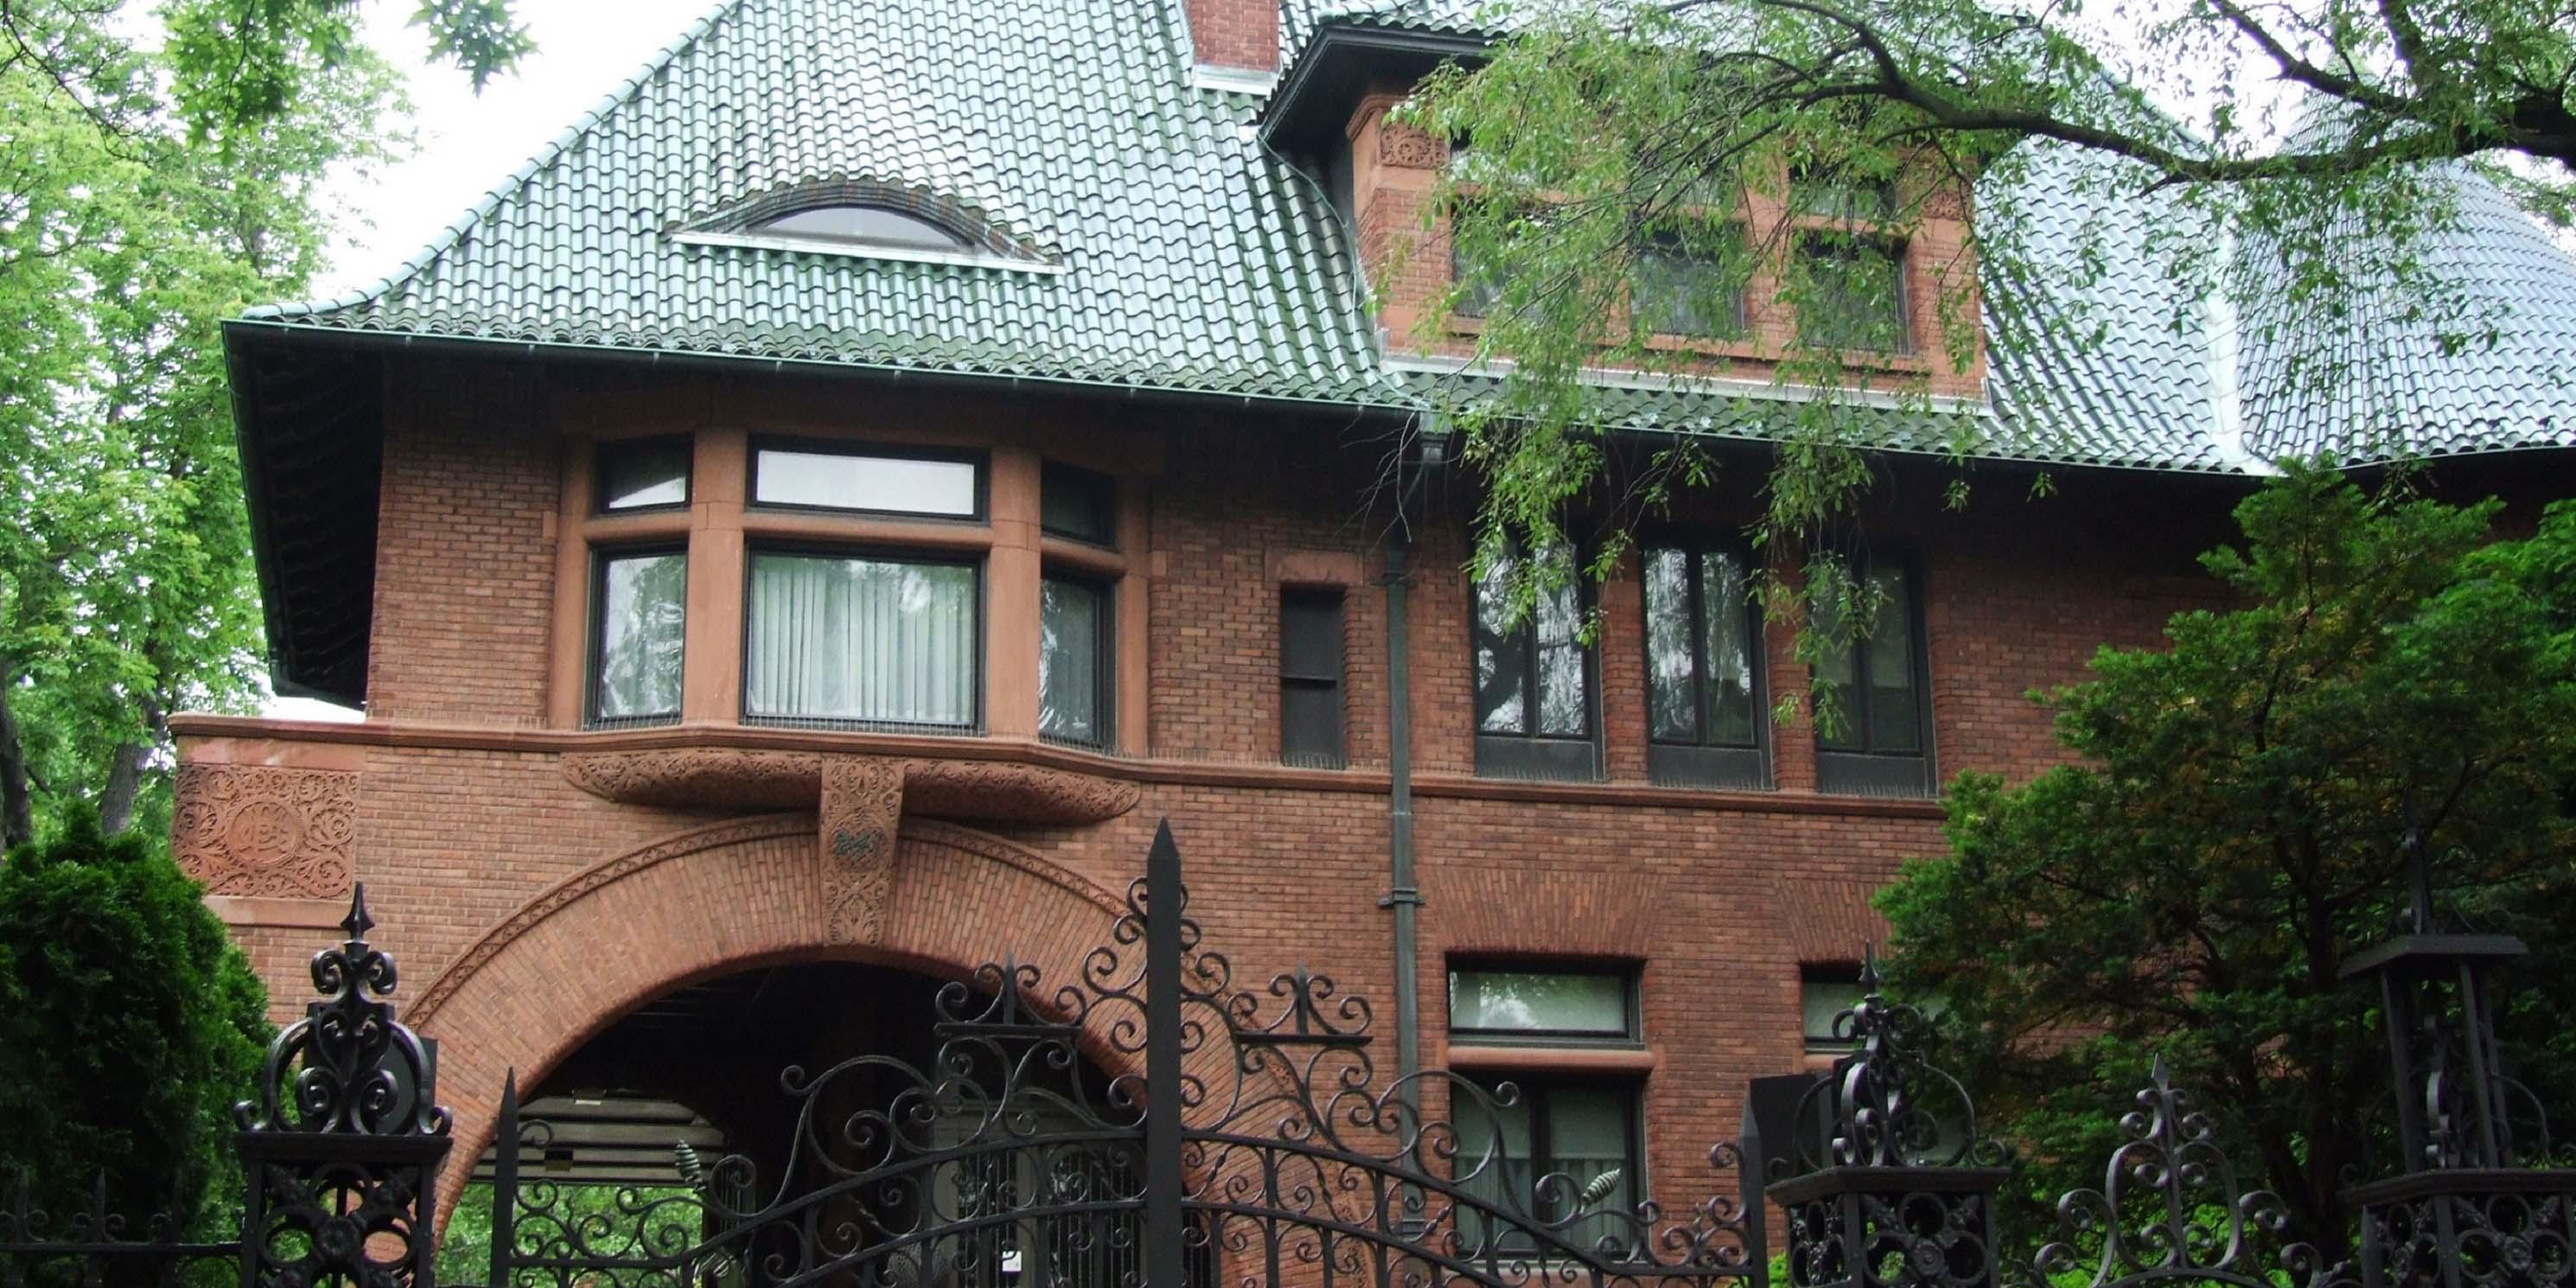 Houses in Clinton Hill, Brooklyn